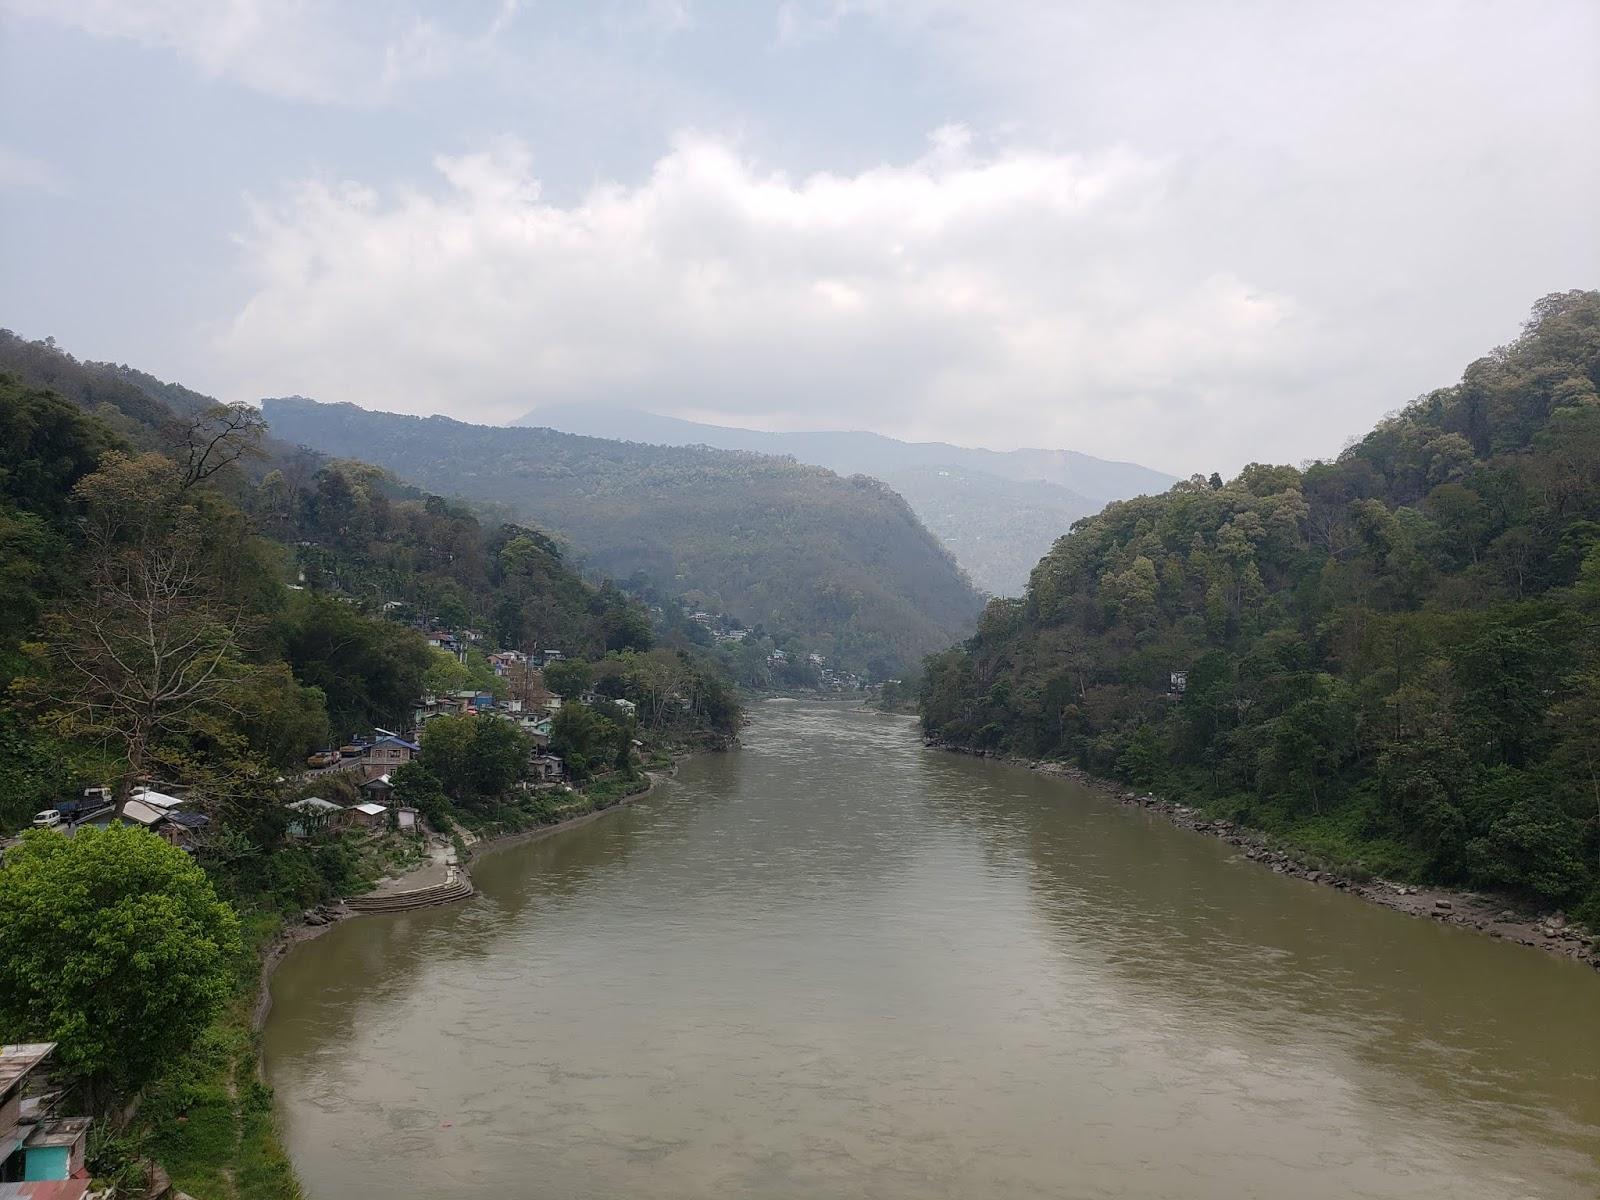 तीस्ता नदी का पुल